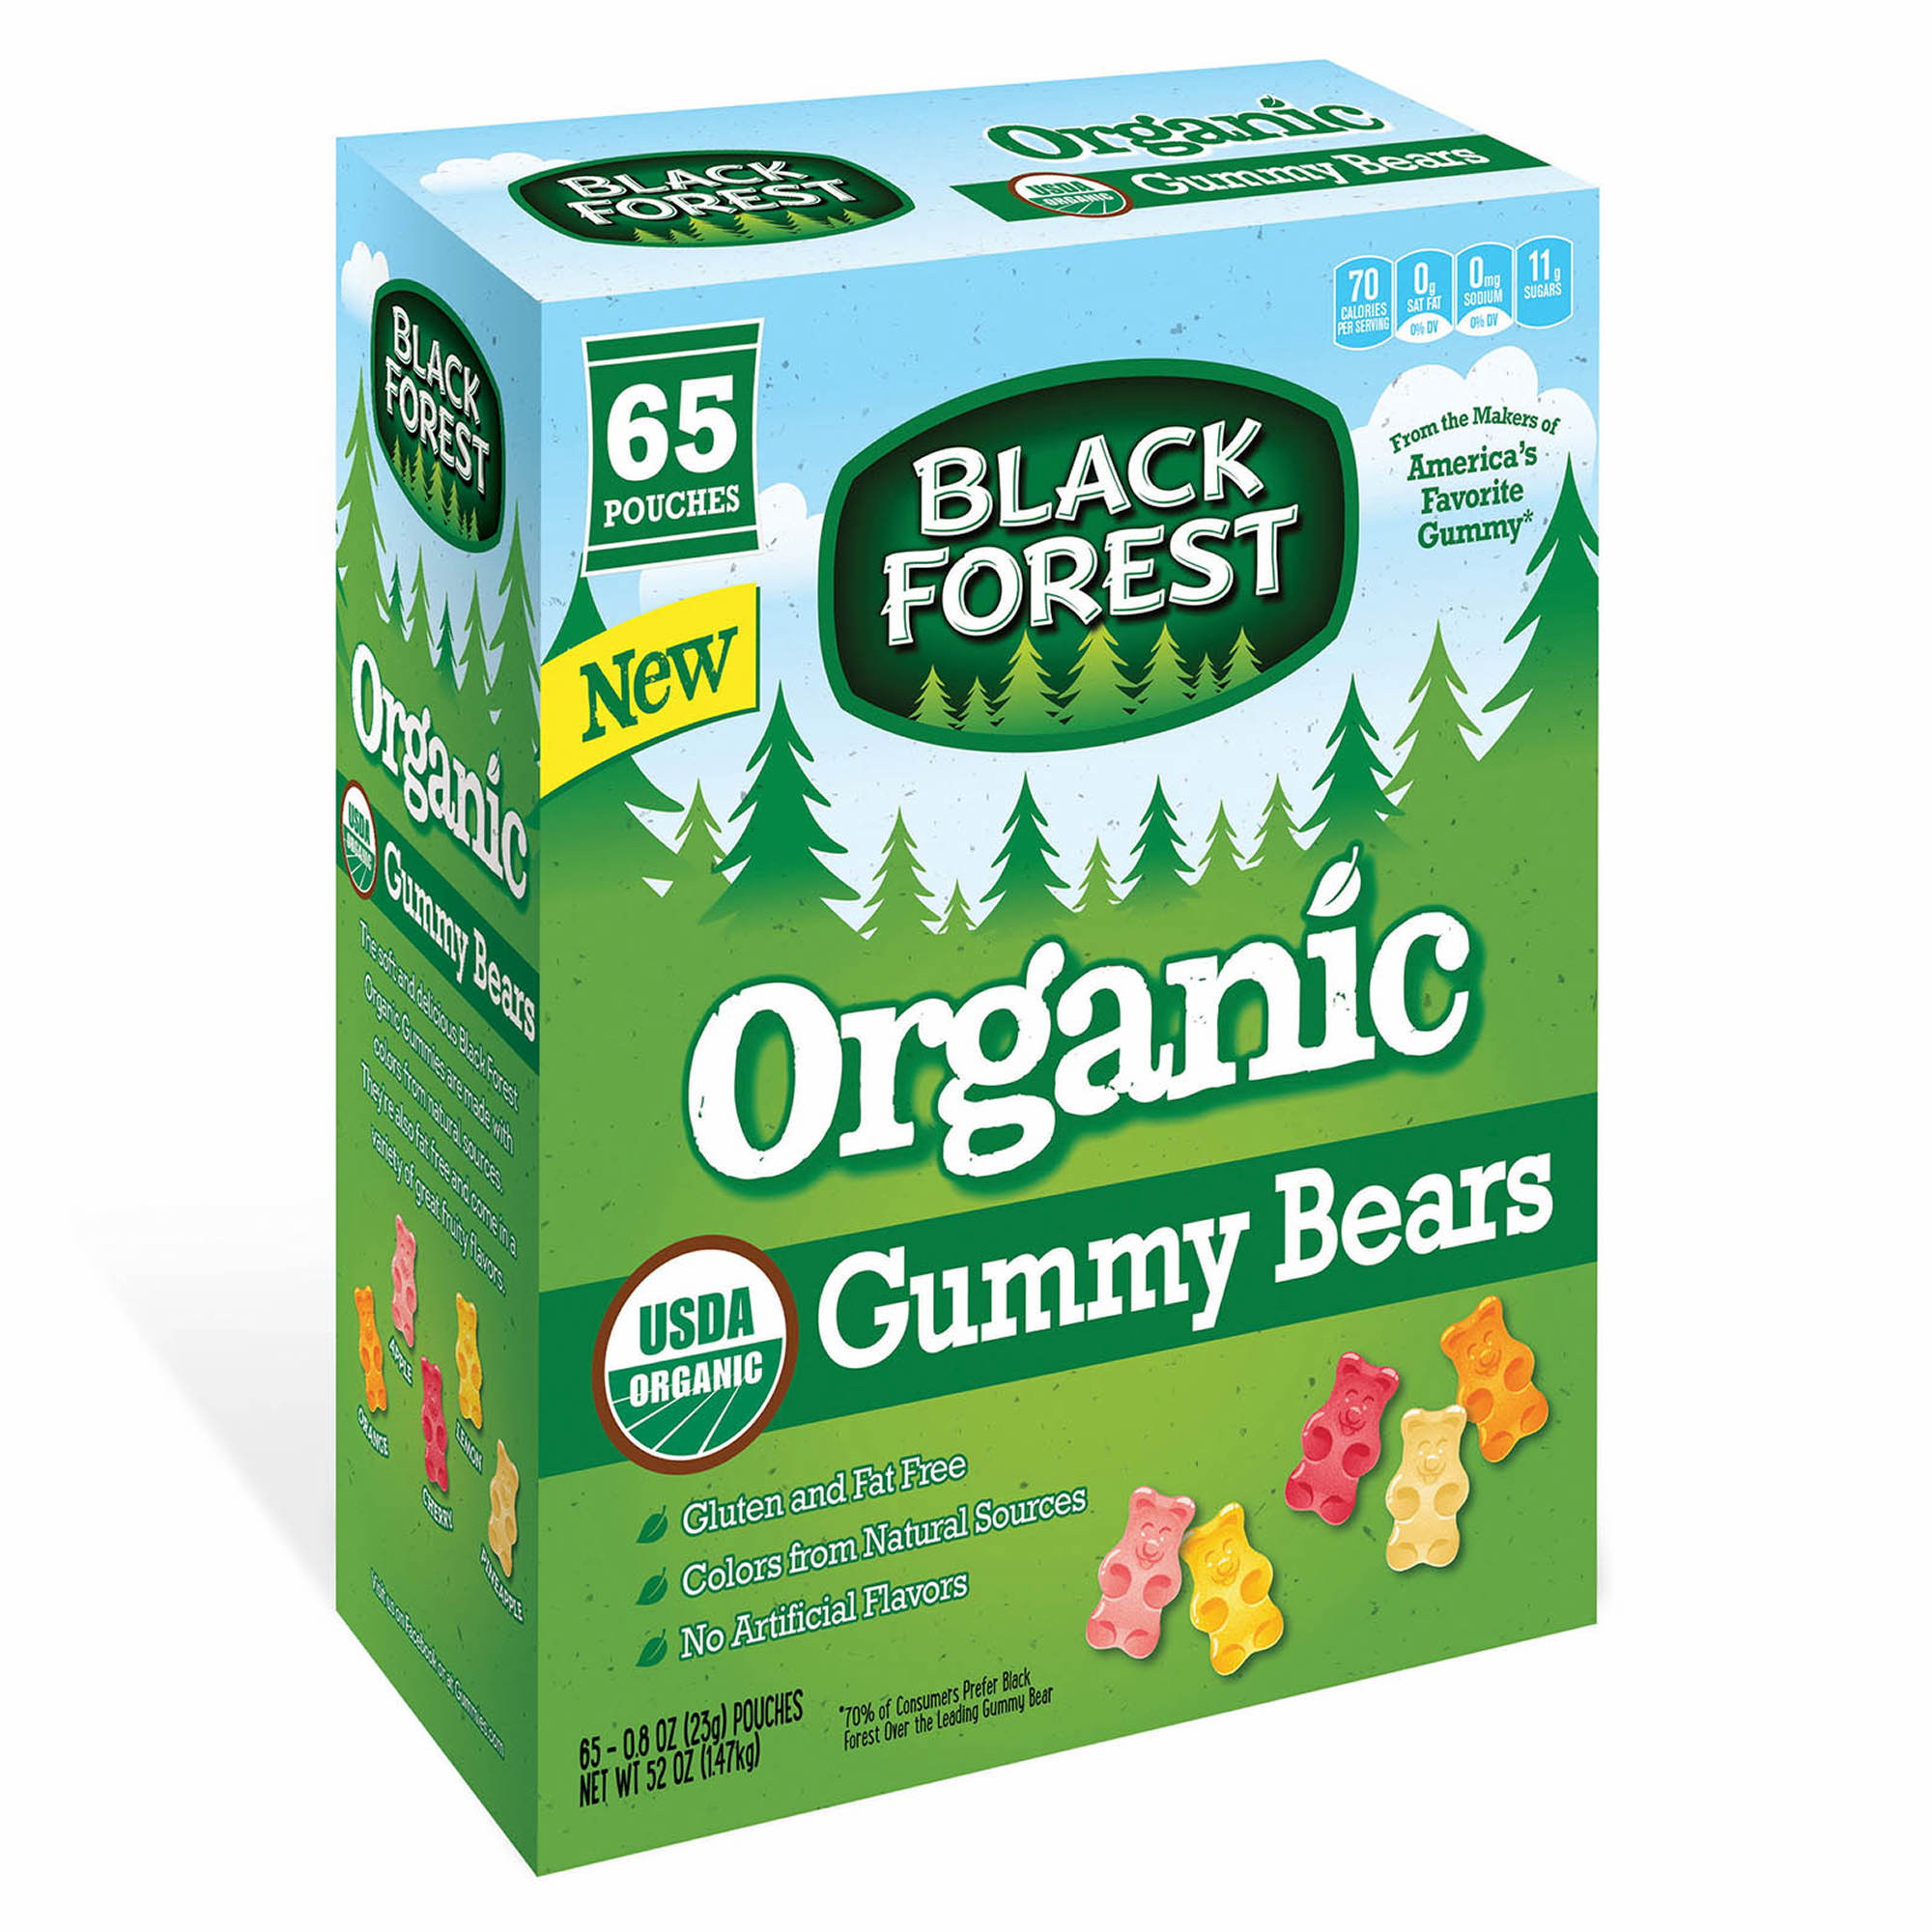 Black Forest Organic Gummy Bears, 65 pk.